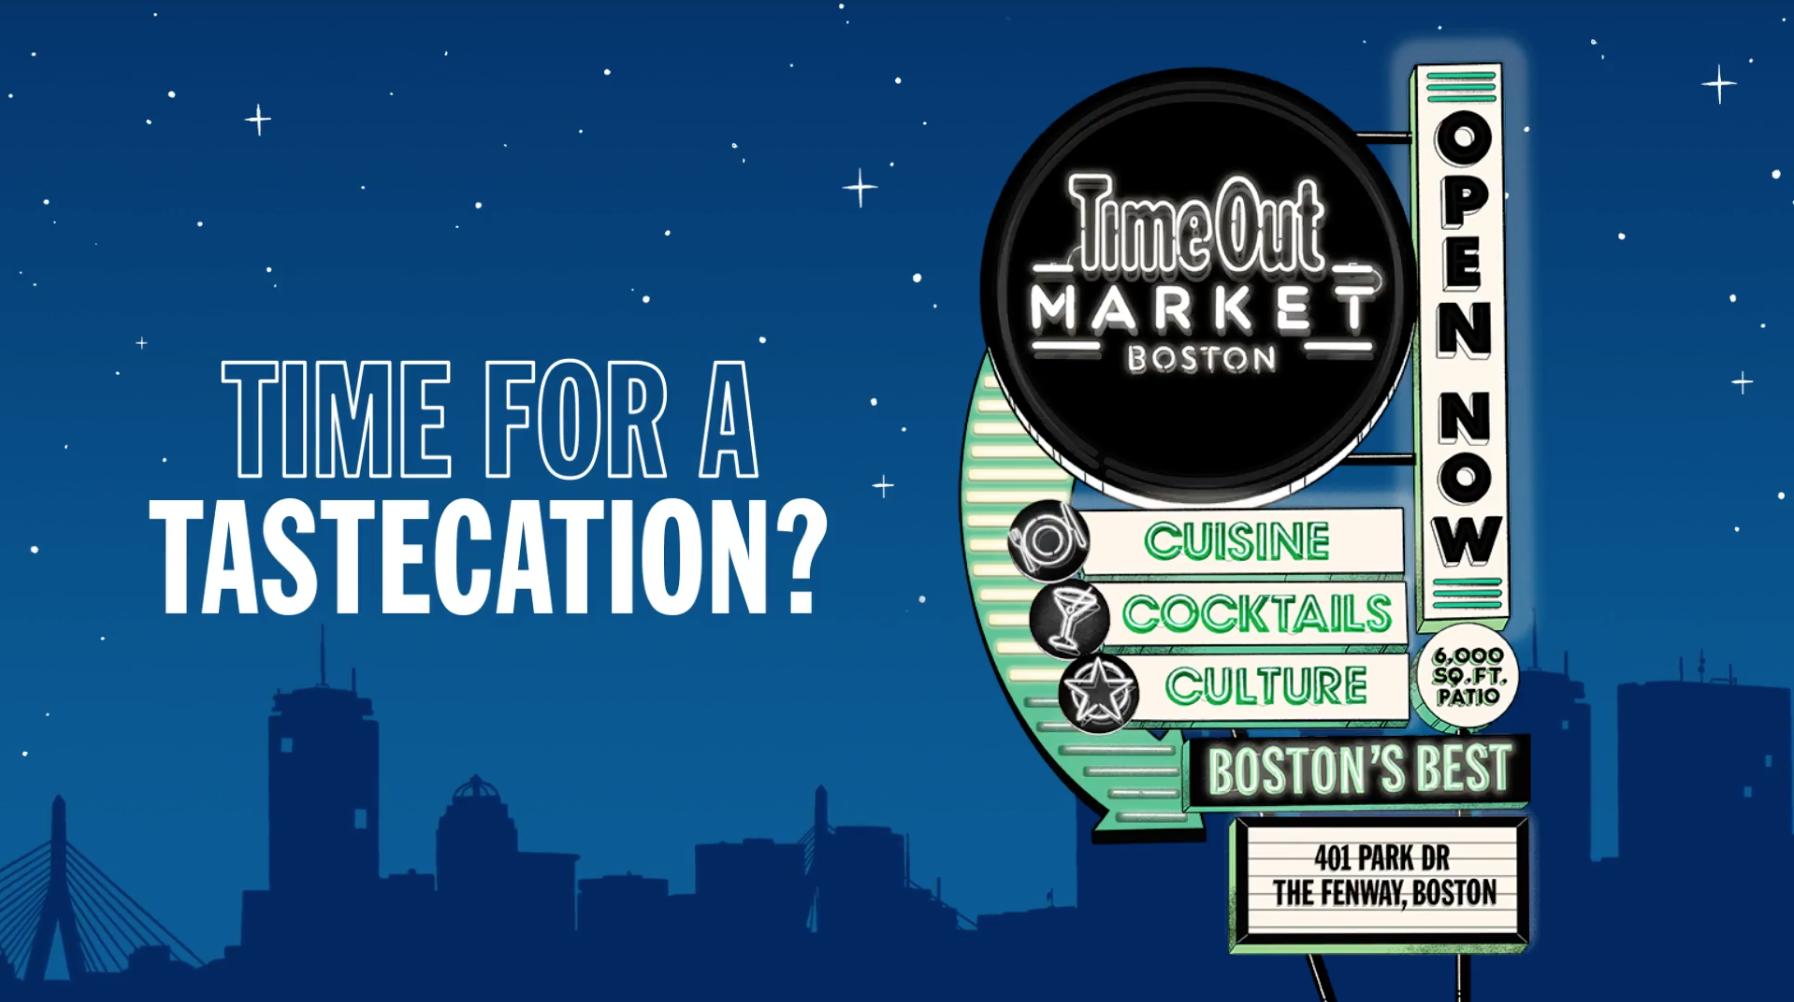 Time Out Market Tastecation